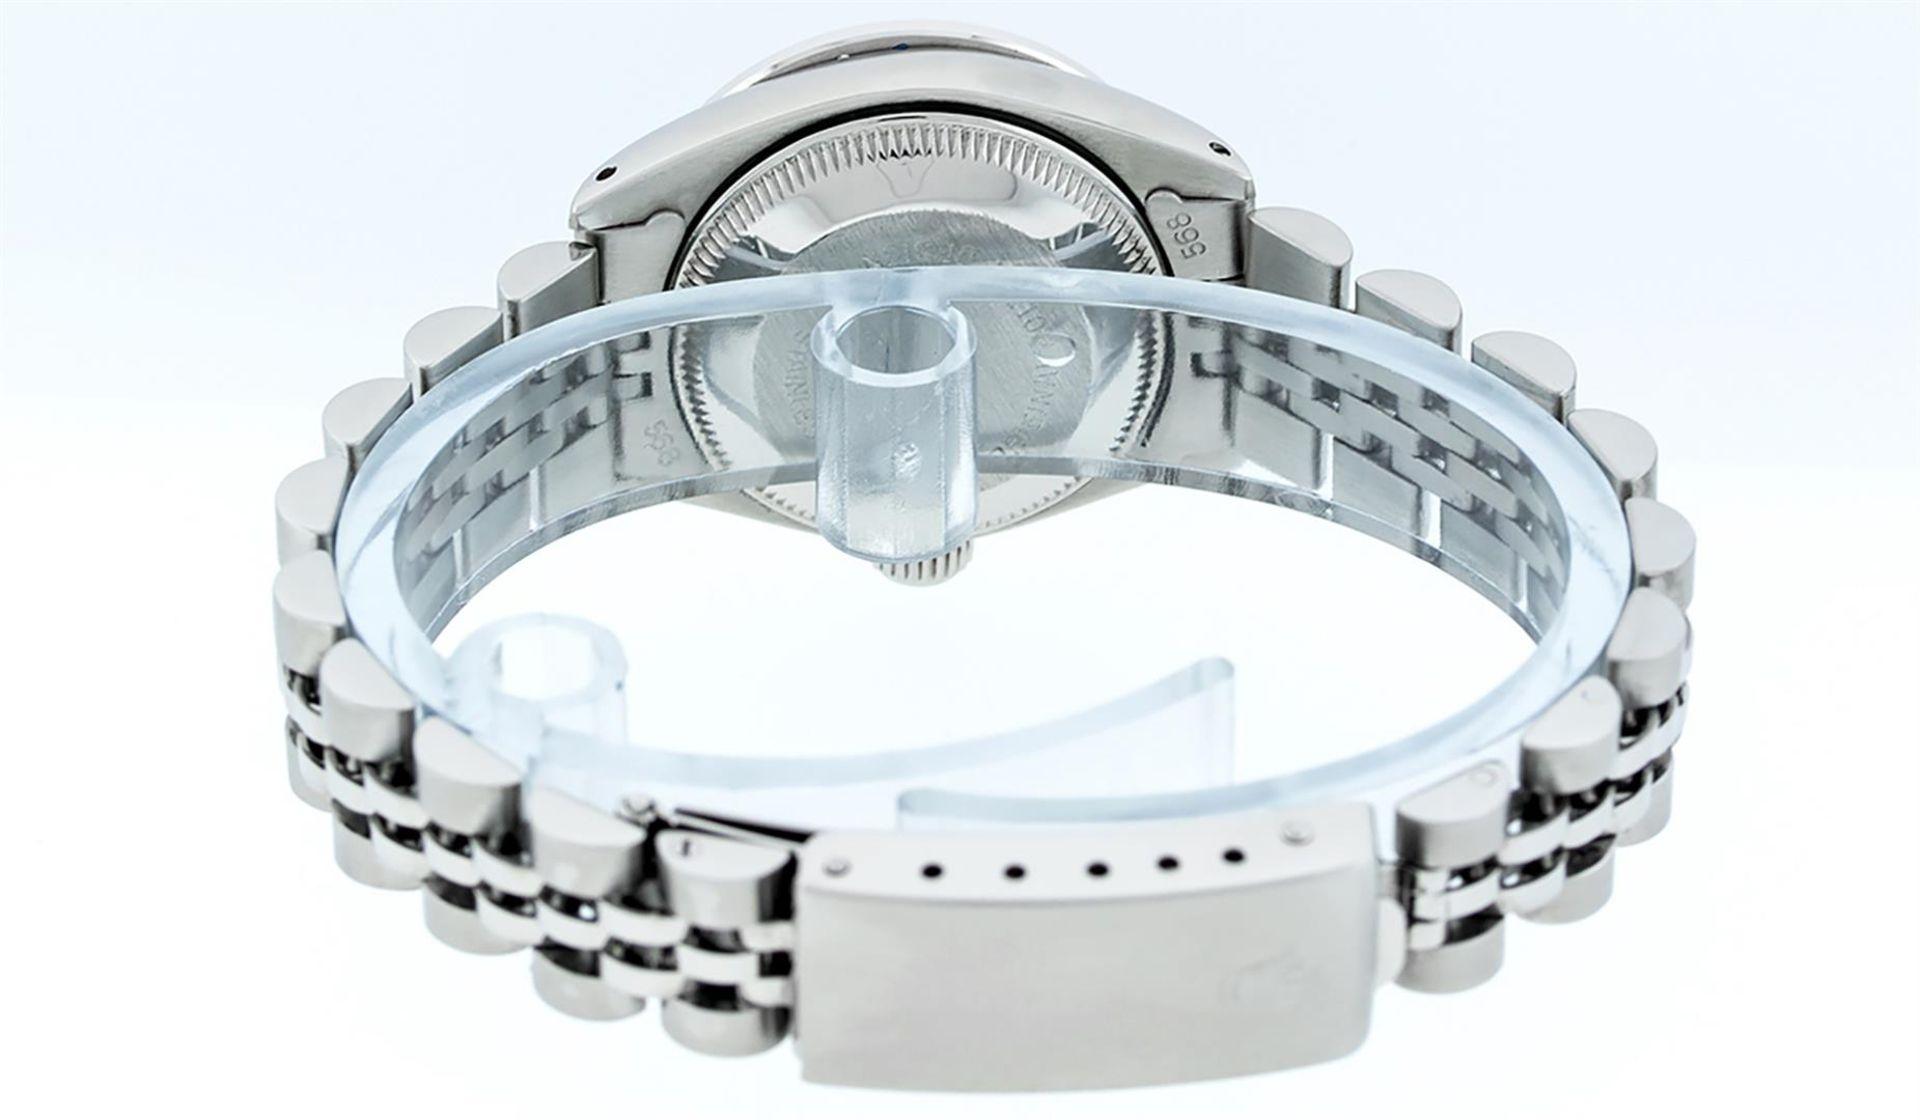 Rolex Ladies Stainless Steel Blue MOP Diamond & Emerald Datejust Wristwatch - Image 8 of 9